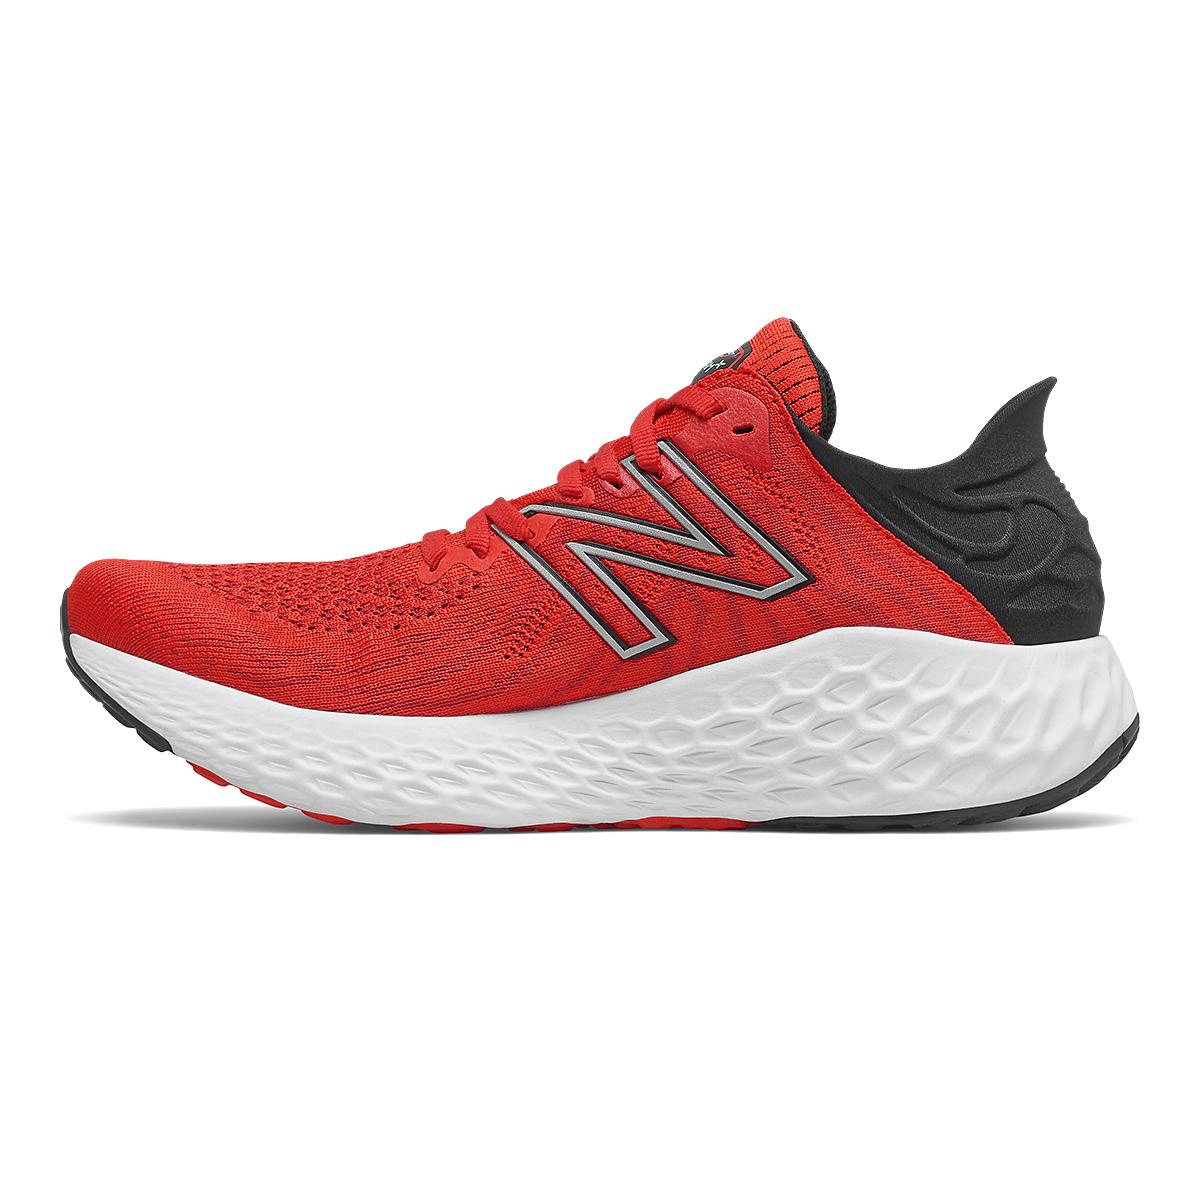 Men's New Balance 1080v11 Running Shoe - Color: Velocity Red/Black - Size: 7 - Width: Wide, Velocity Red/Black, large, image 2